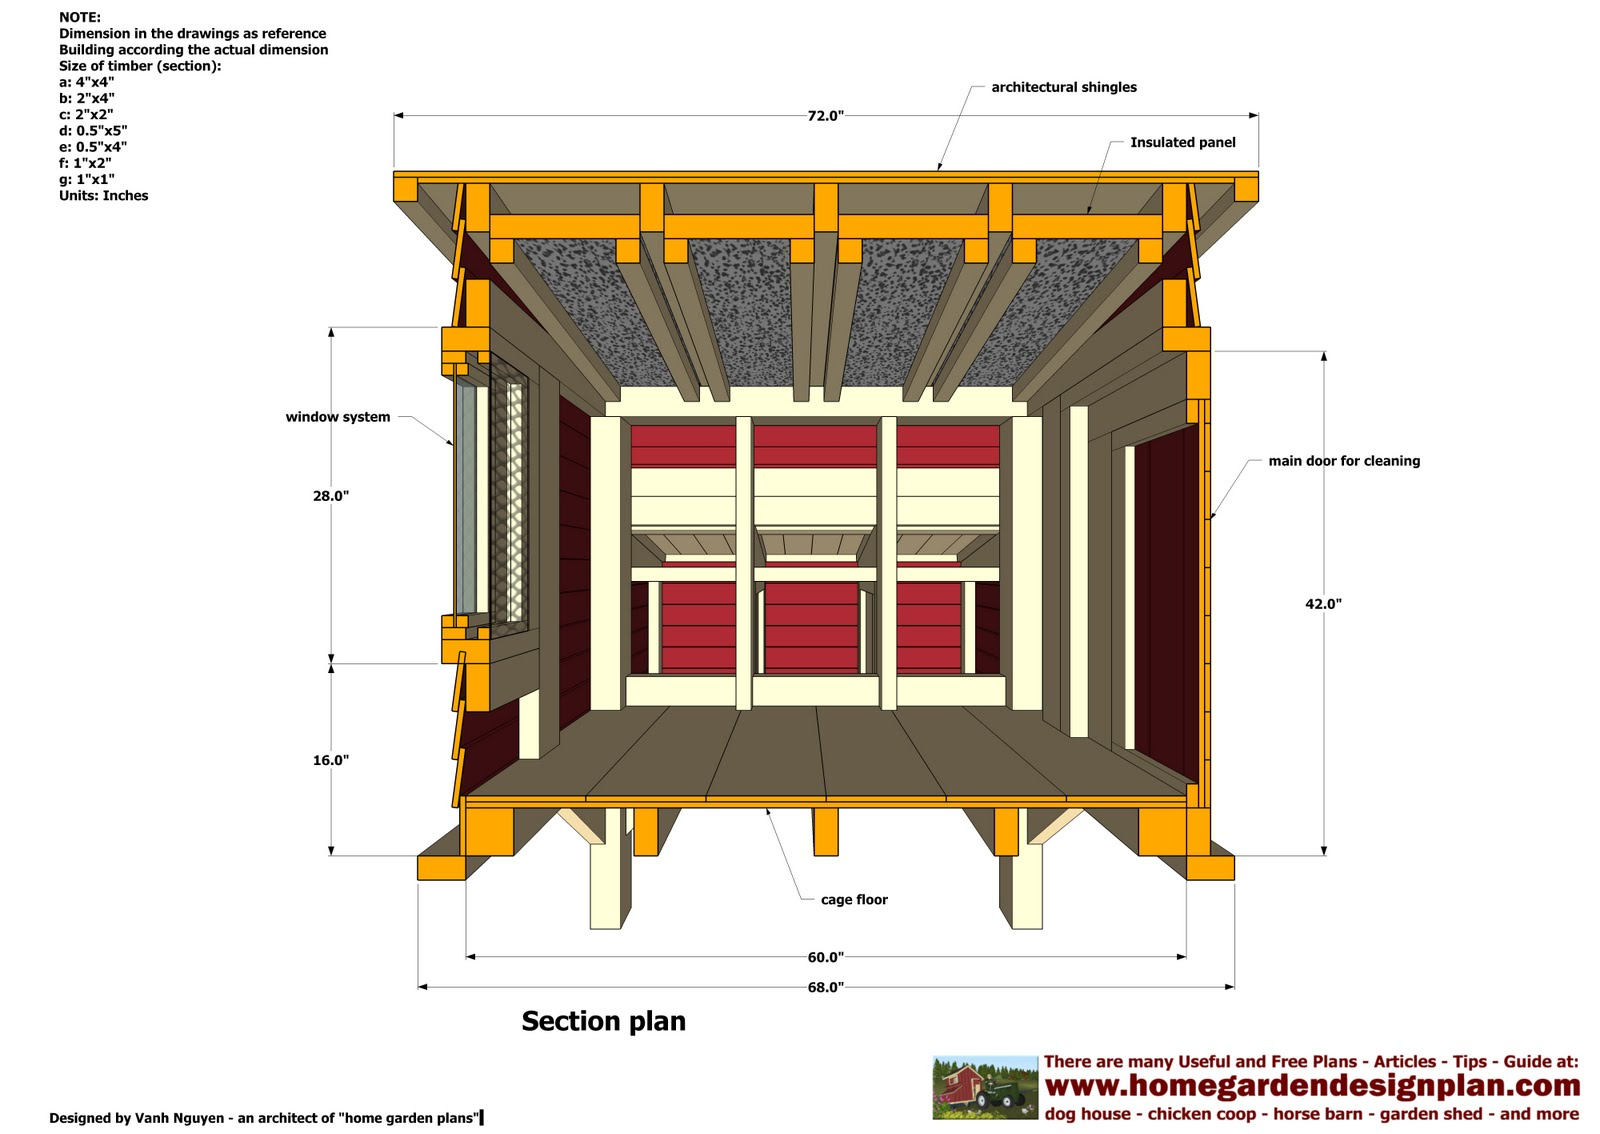 Gellencoop share chicken coop plans free download for Chicken ark plans free download